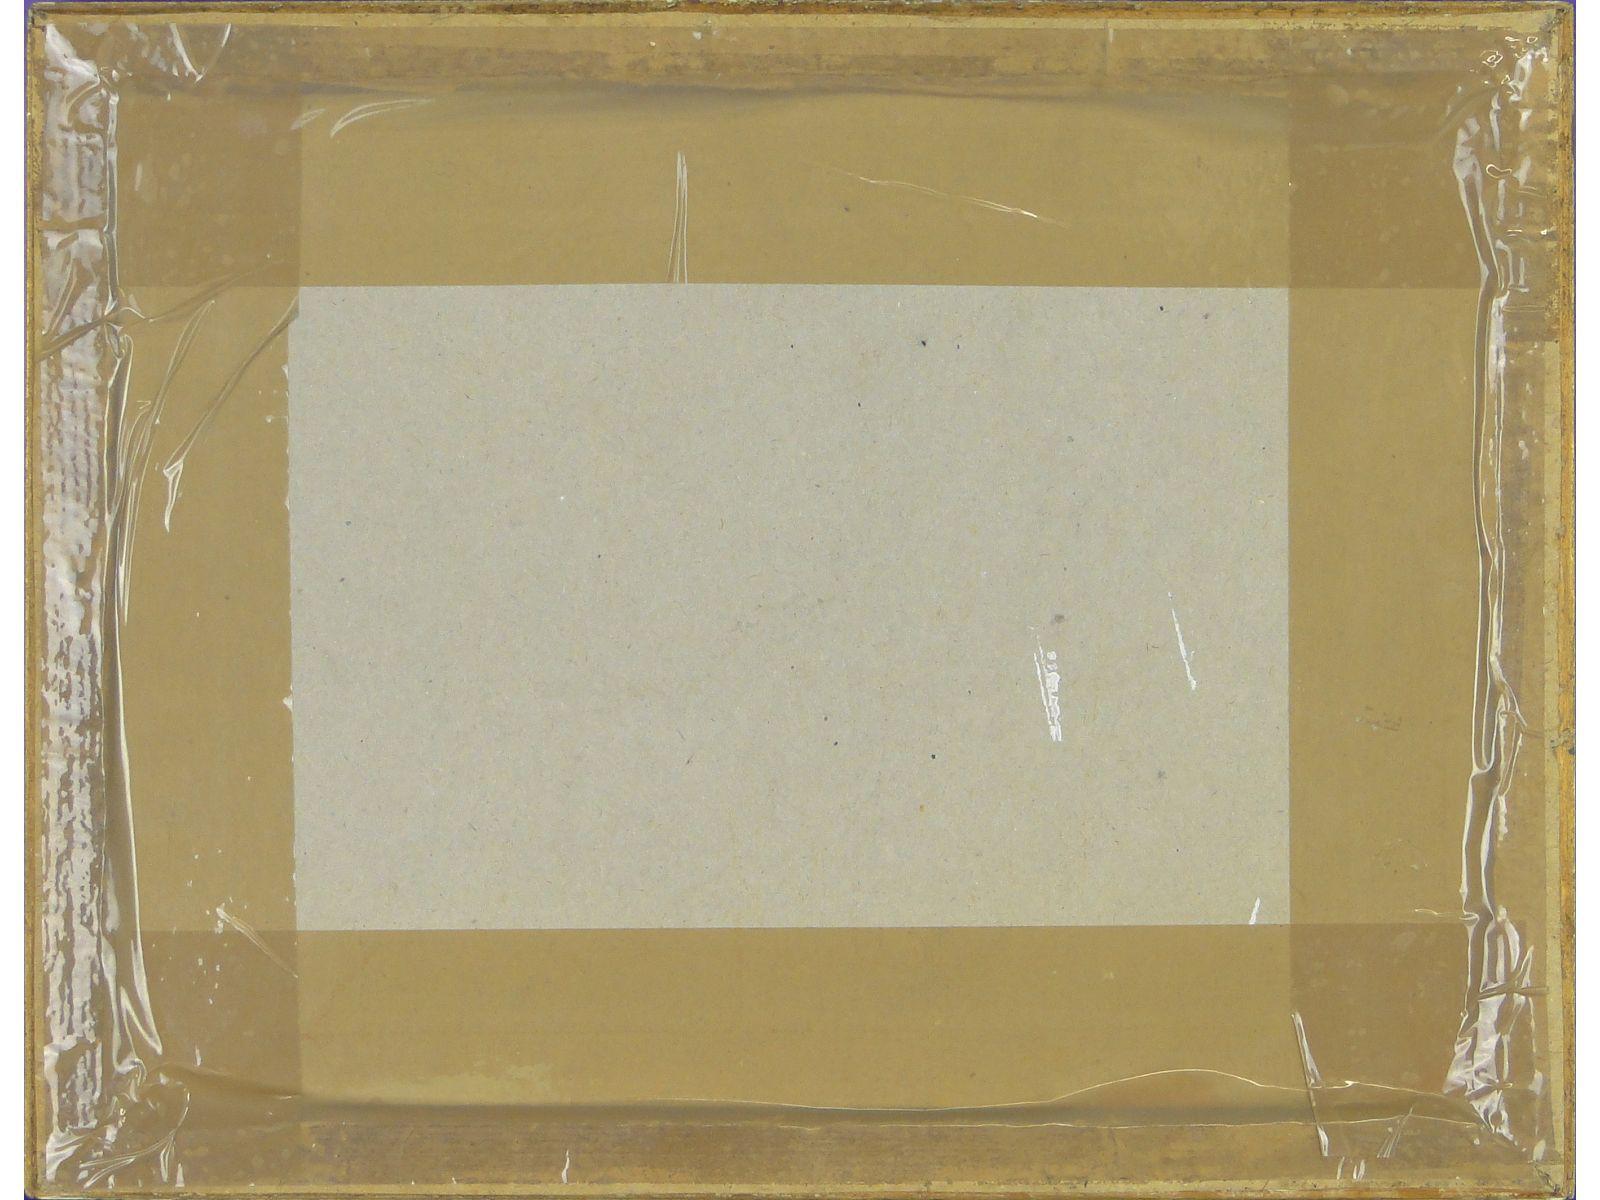 DSC05362.JPG (1600×1200)